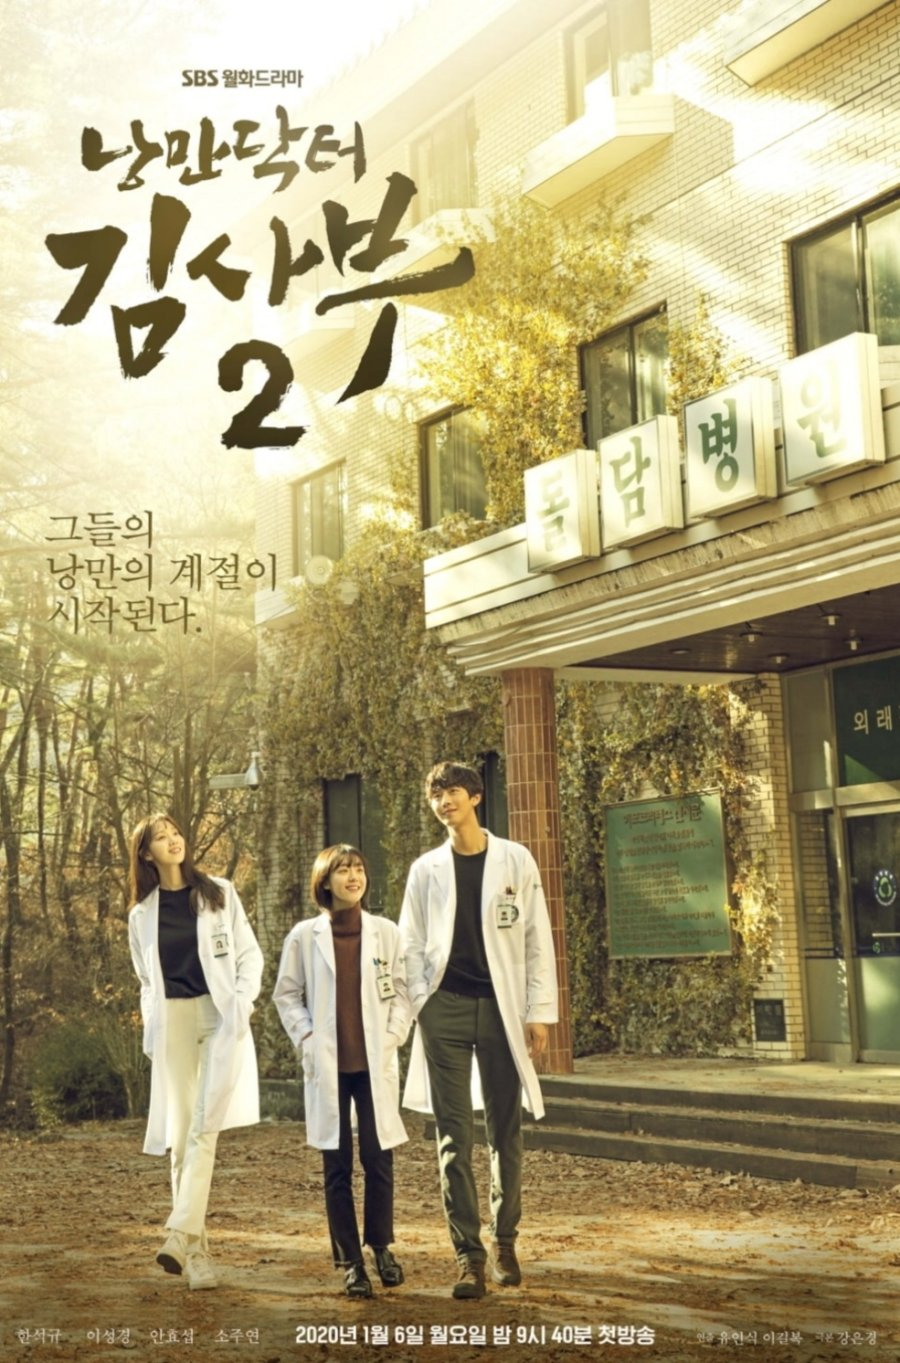 Người Thầy Y Đức 2, Người Thầy Y Đức 2 VietSub, Romantic Doctor, Teacher Kim 2 (2020), Romantic Doctor, Teacher Kim 2 VietSub